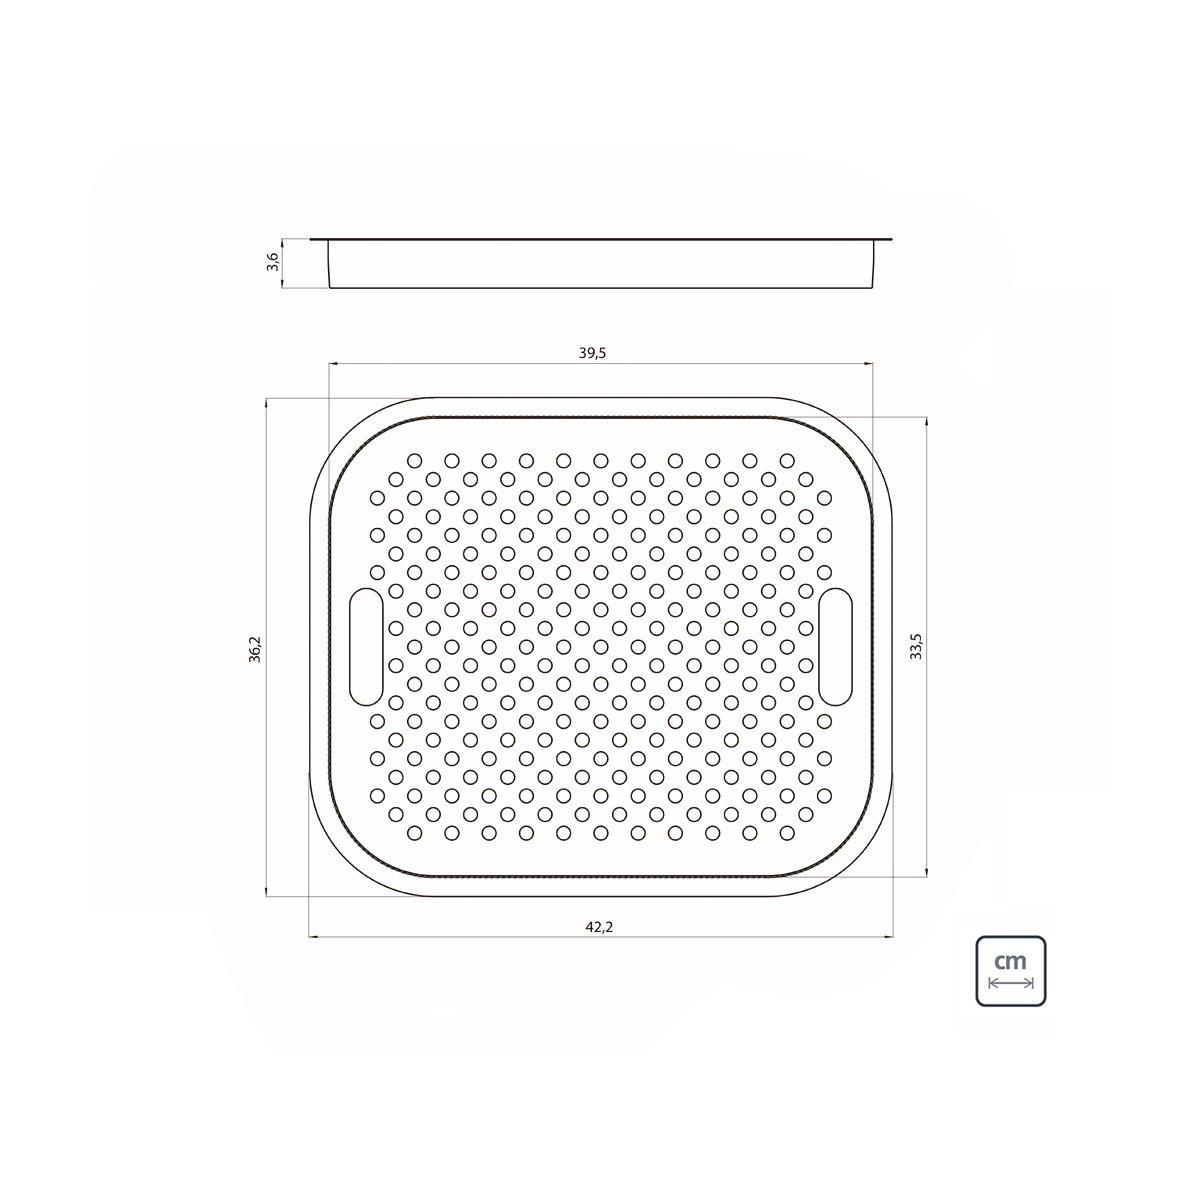 Bandeja Perfurada Tramontina em Aço Inox para Pias e Cubas 42 x 36 cm  Tramontina 94532014